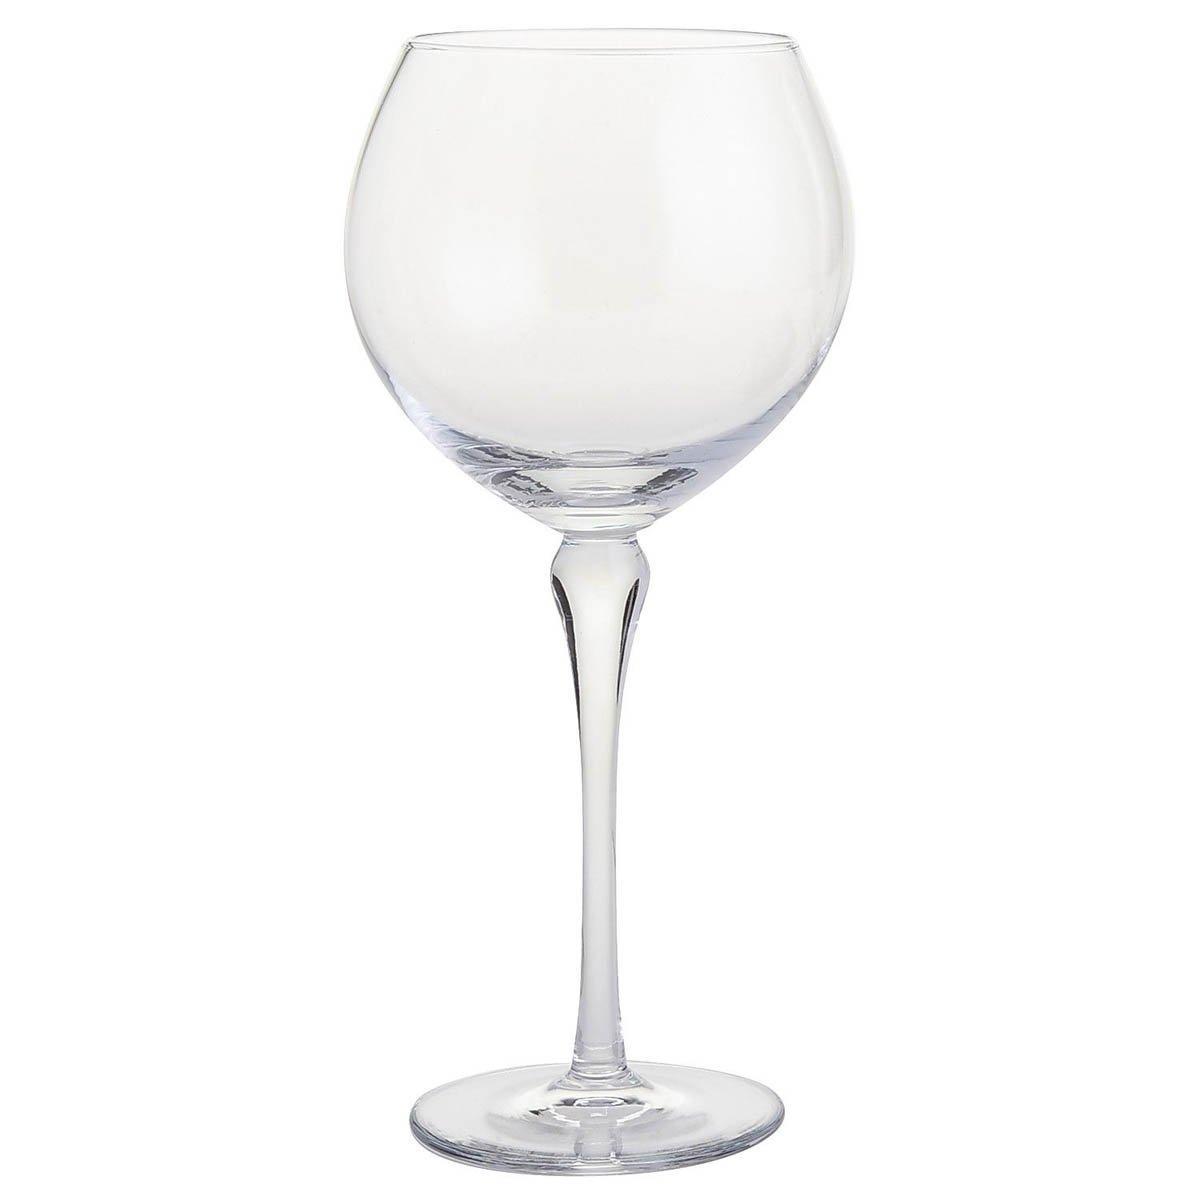 Copa de agua carlisle pier 1 sears com mx me entiende for Copa de agua